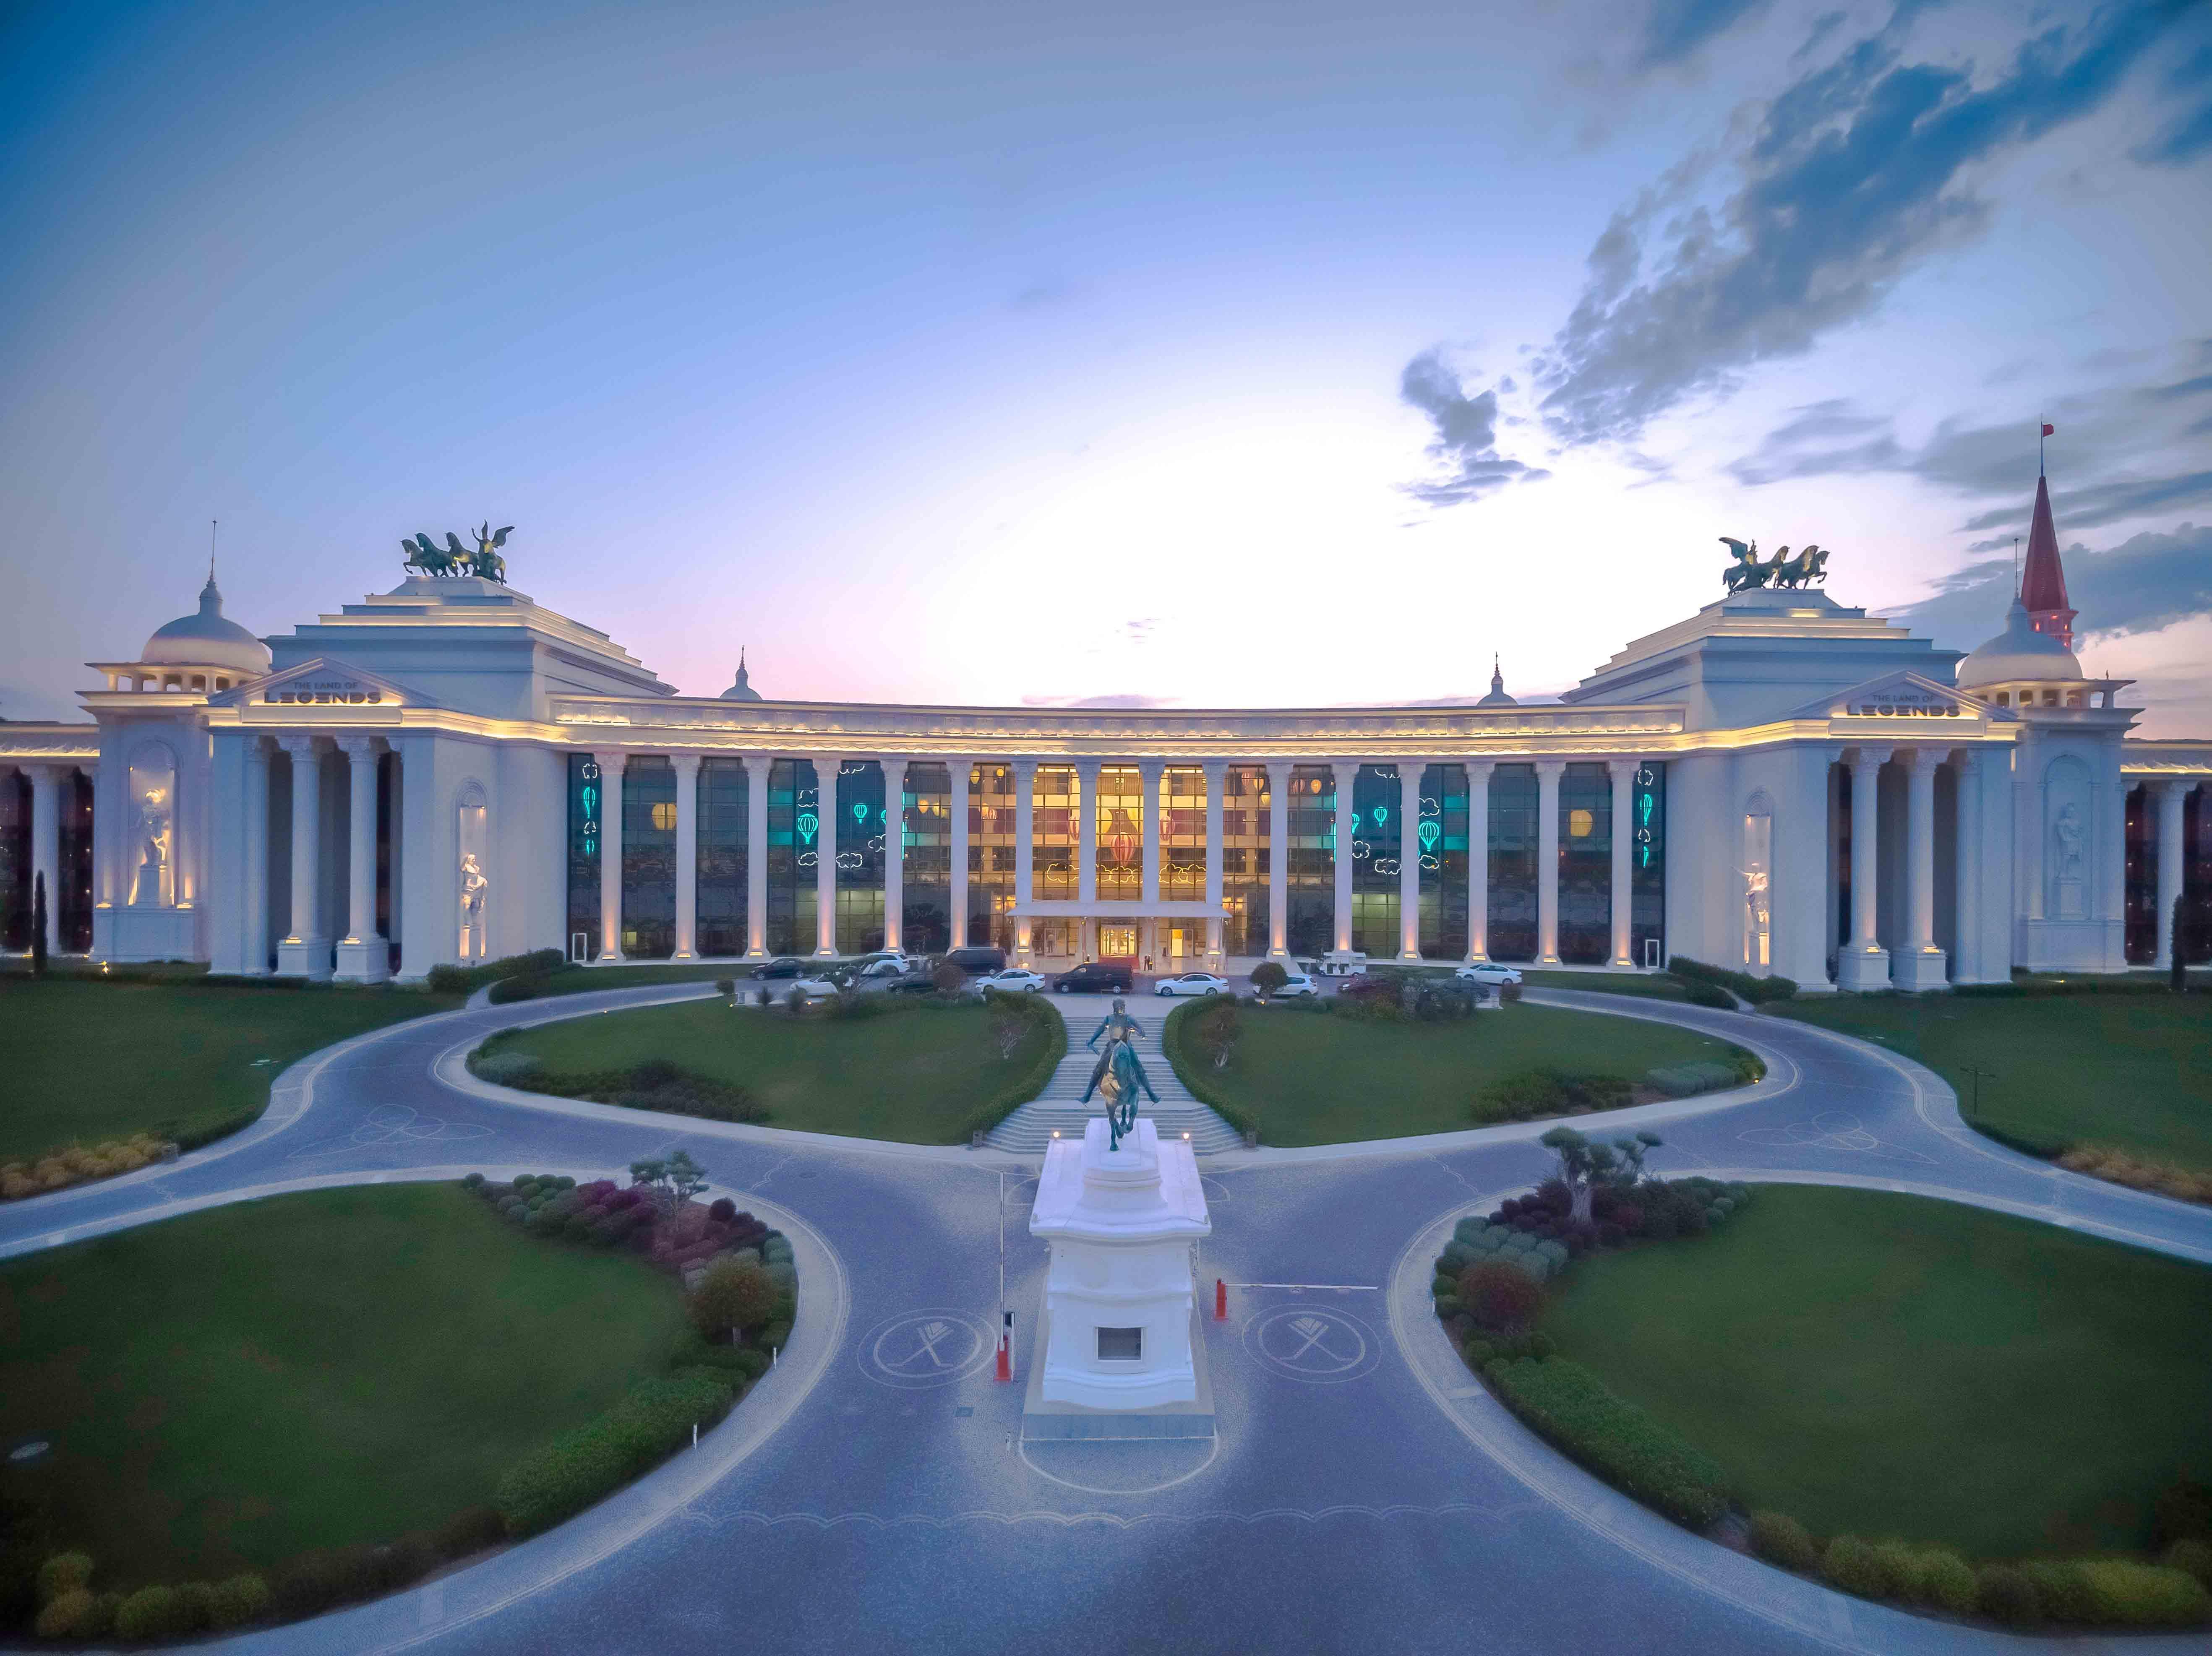 THE LAND OF LEGENDS - KINGDOM HOTEL